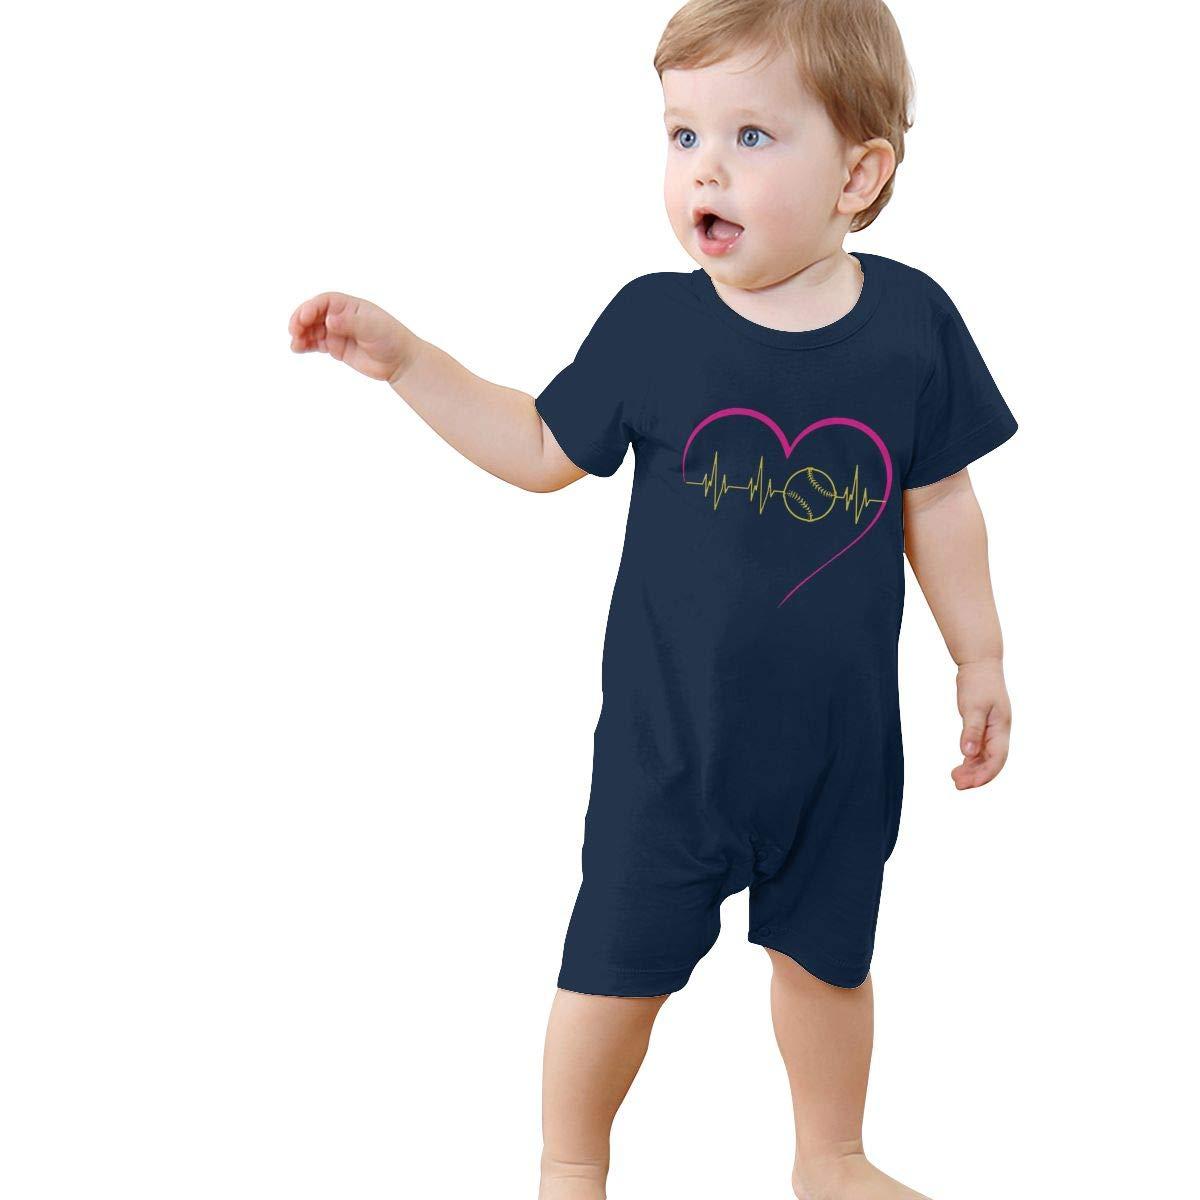 Softball Heartbeat Toddler Baby Short Sleeve Romper Jumpsuit Bodysuits 0-24 Months